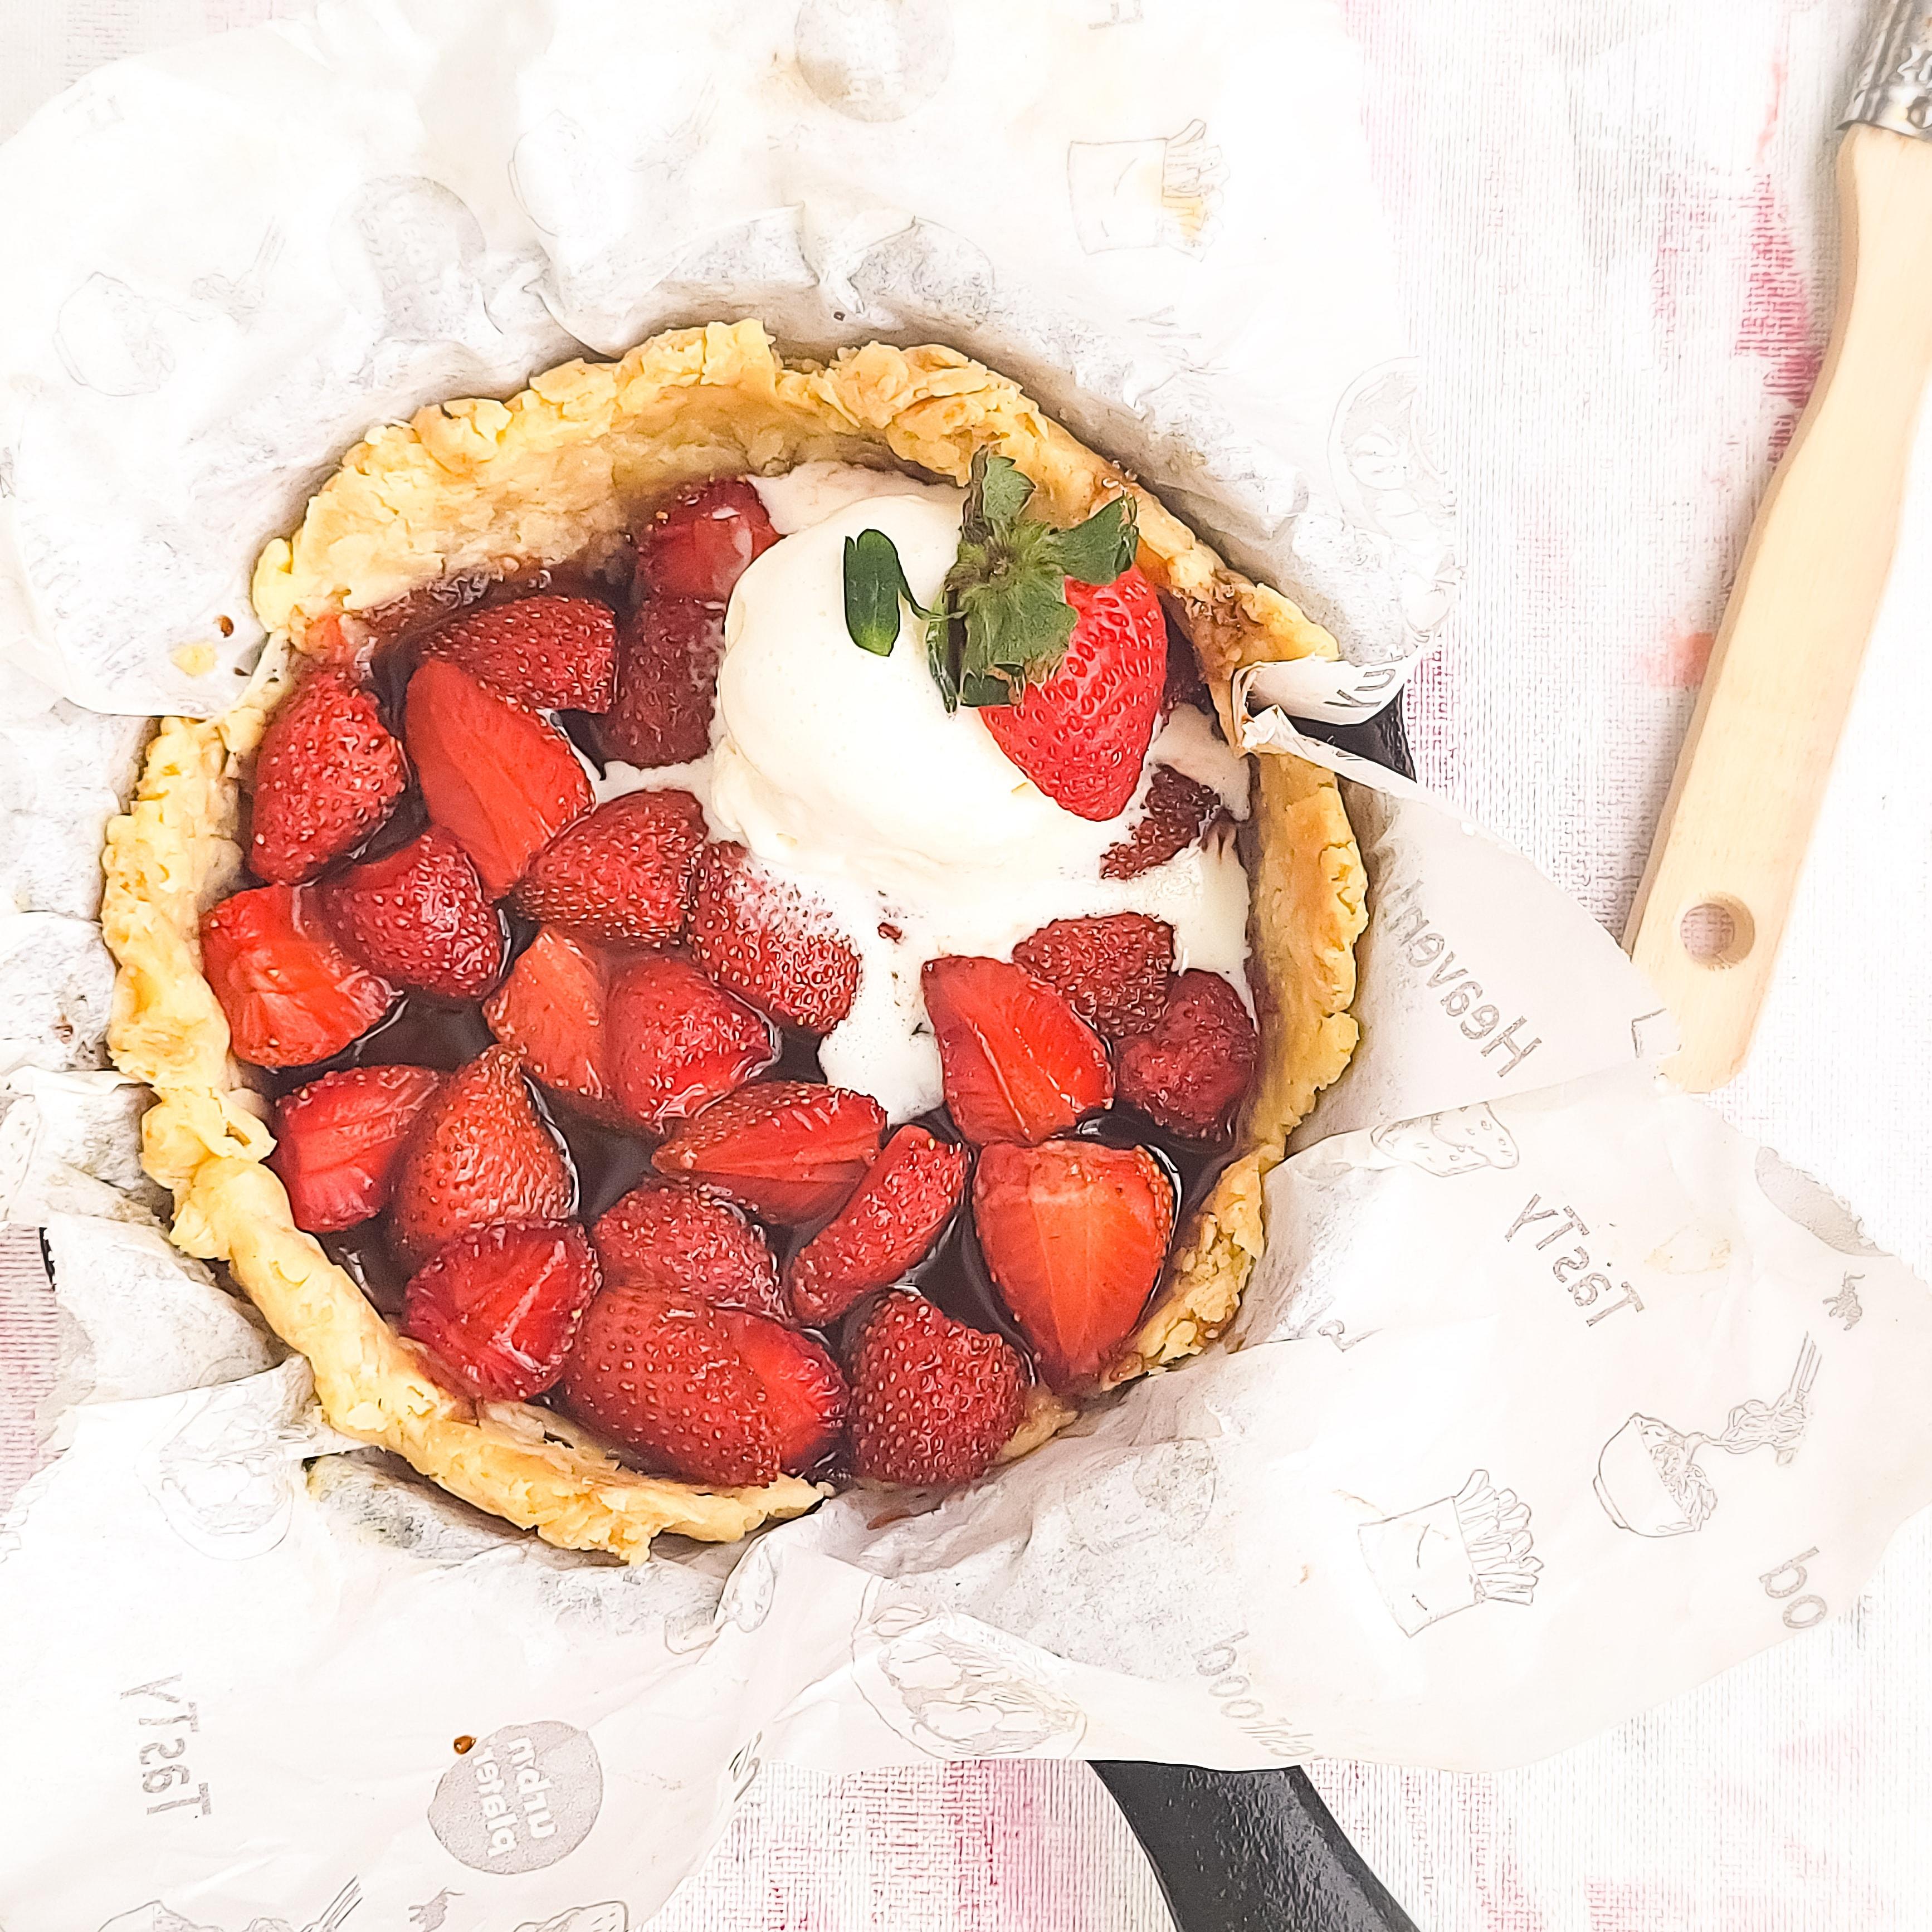 Balsamic roasted Strawberries on a oat-y tart base